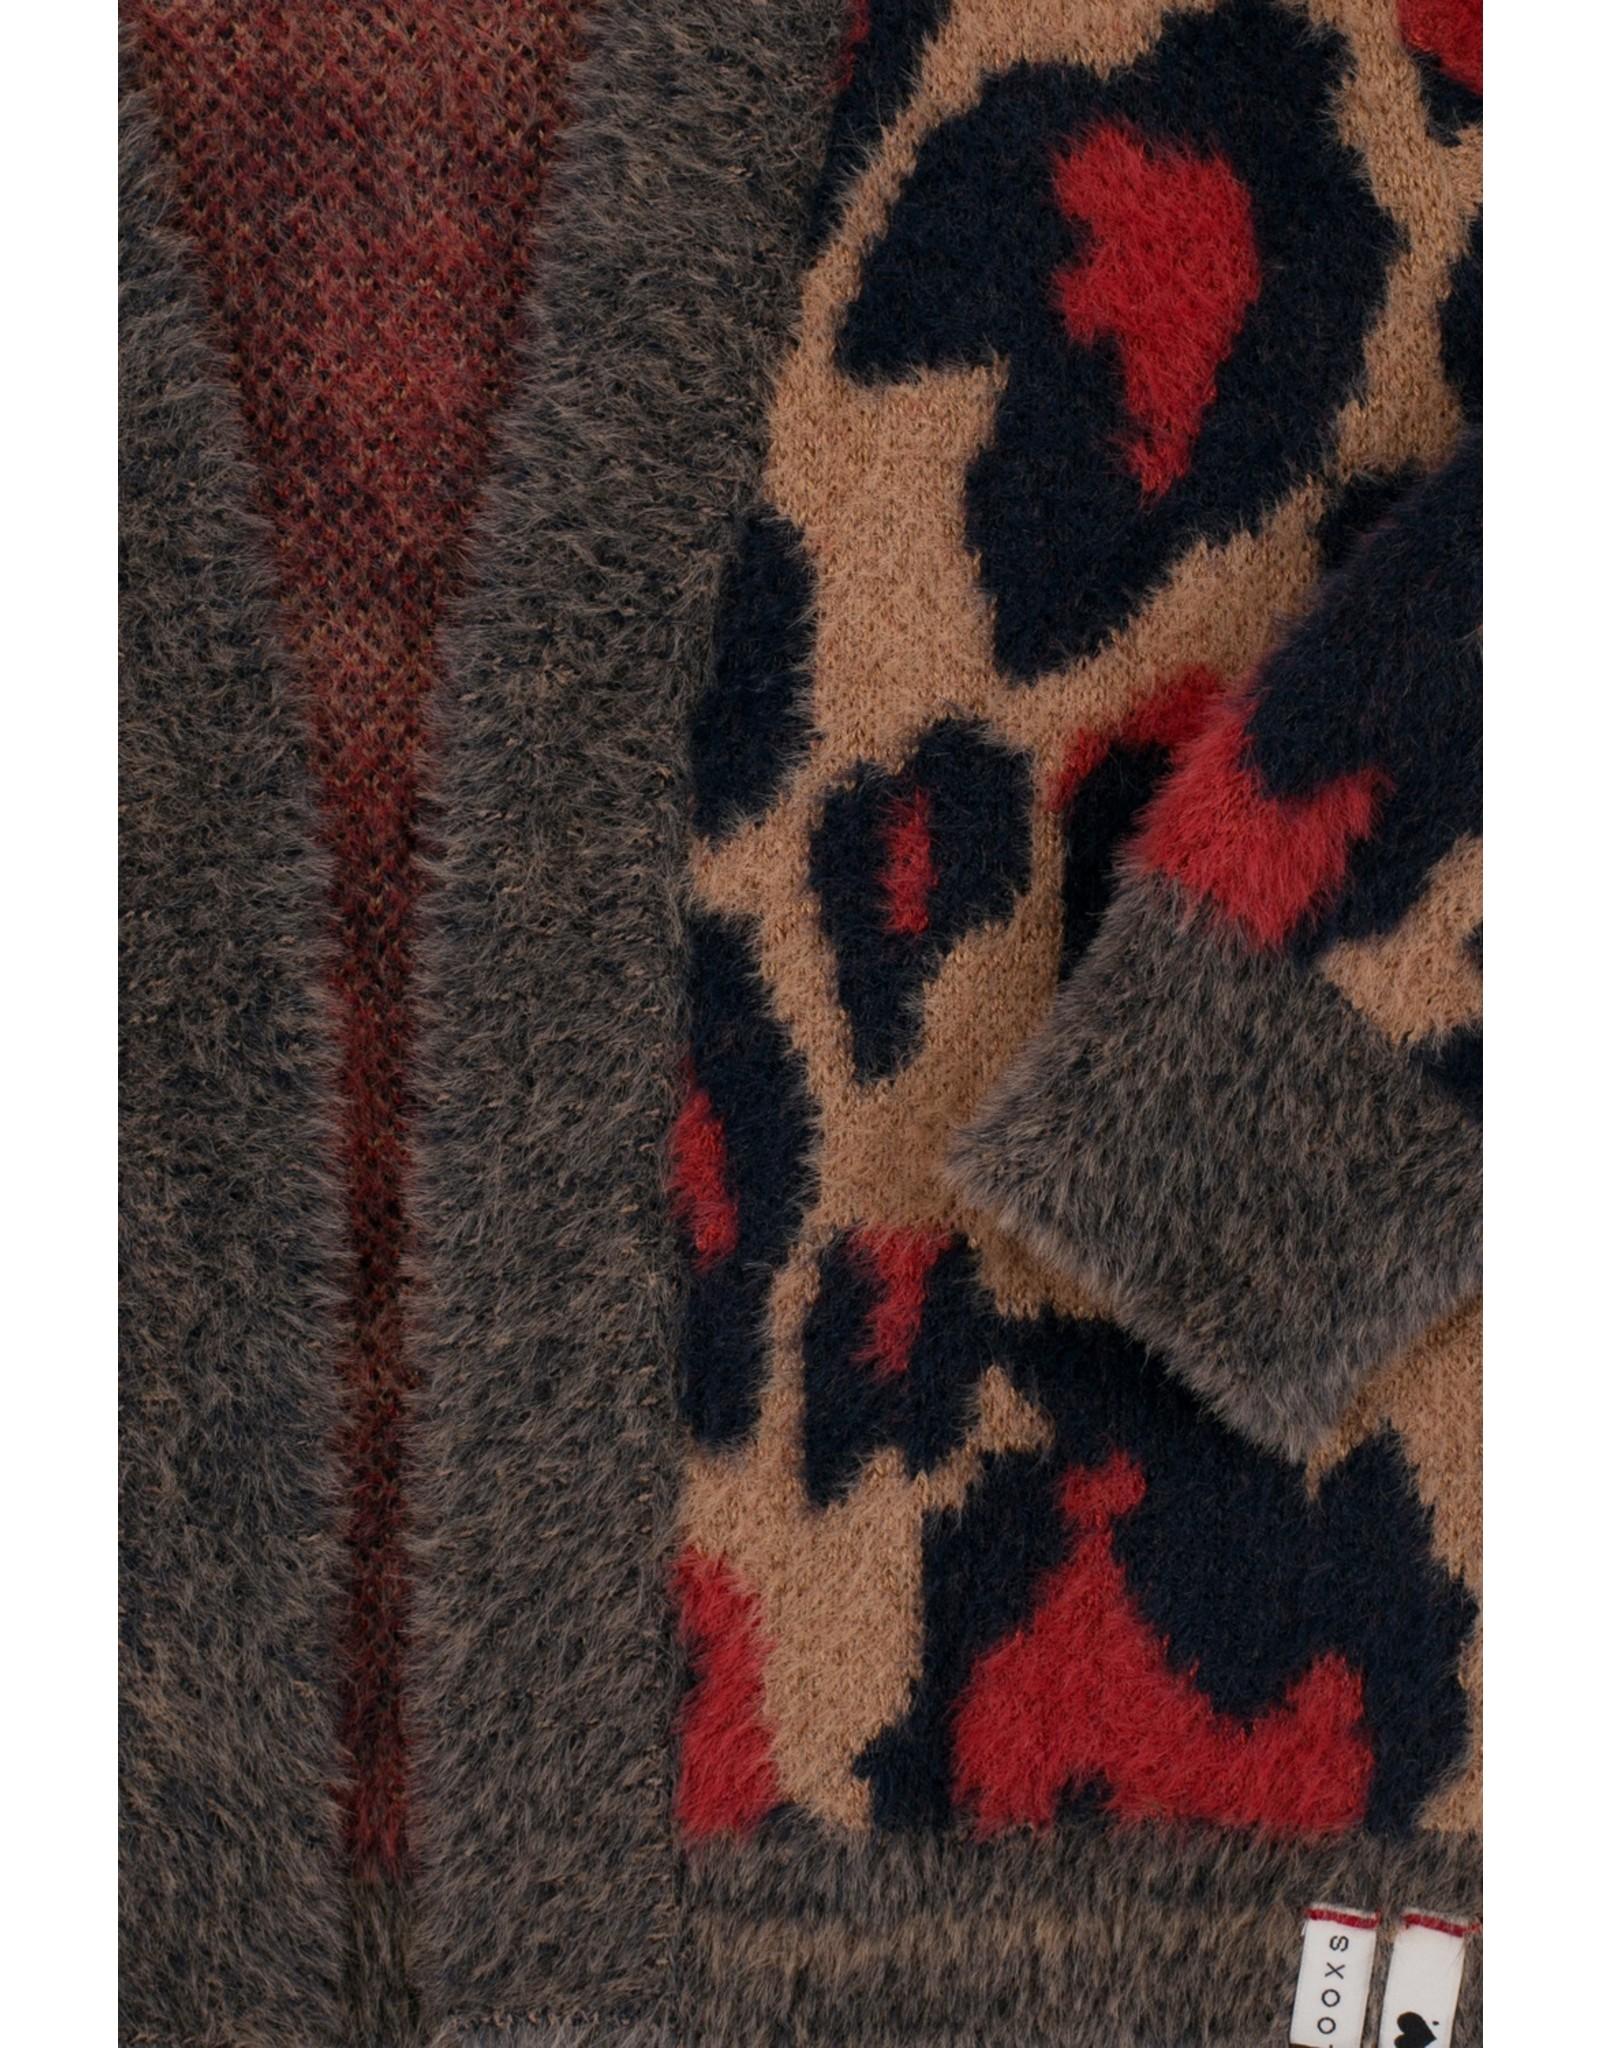 Looxs 10SIXTEEN Girls knitted cardigan c